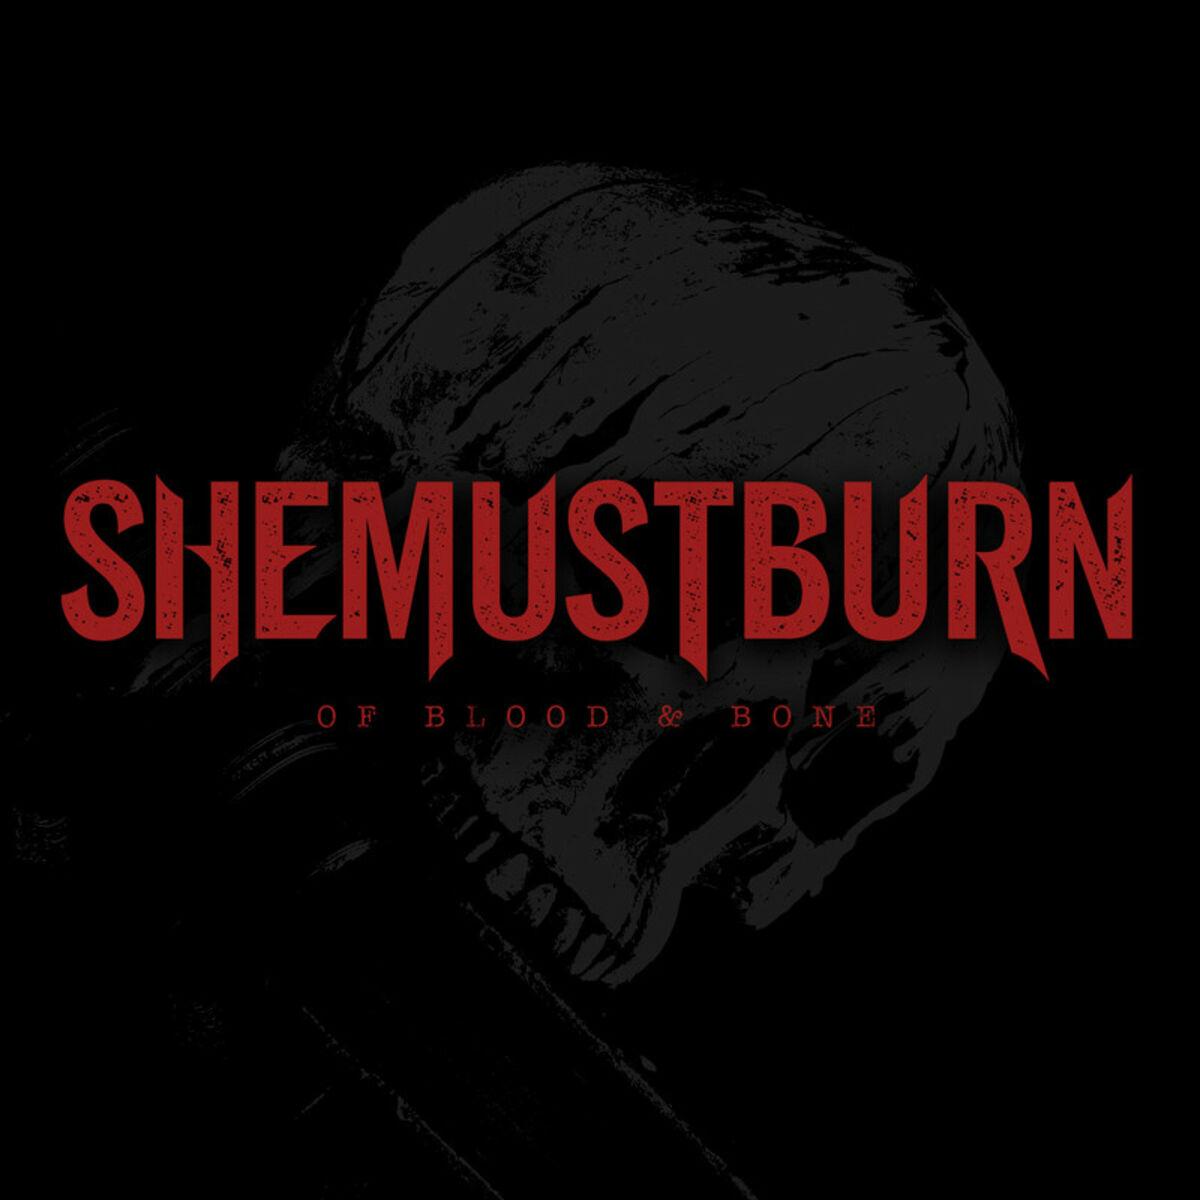 She Must Burn - Of Blood & Bone [single] (2019)